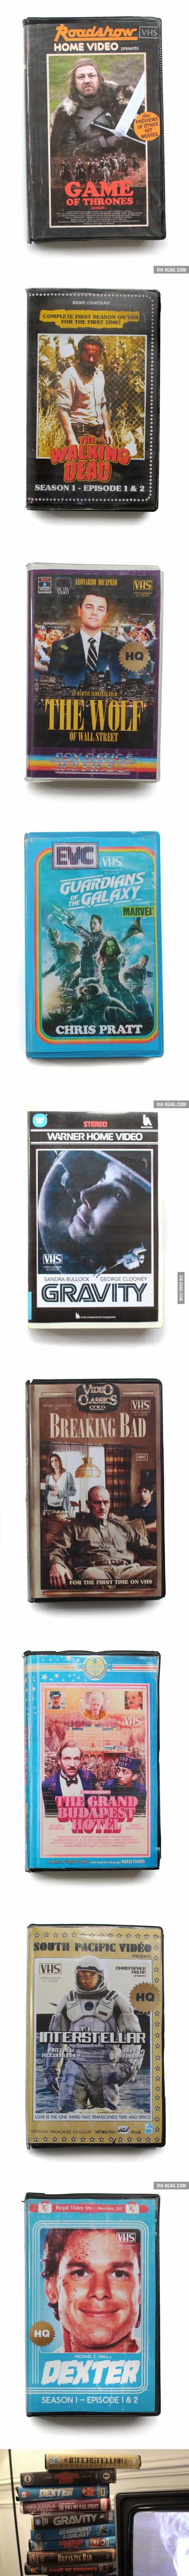 VHS Serie